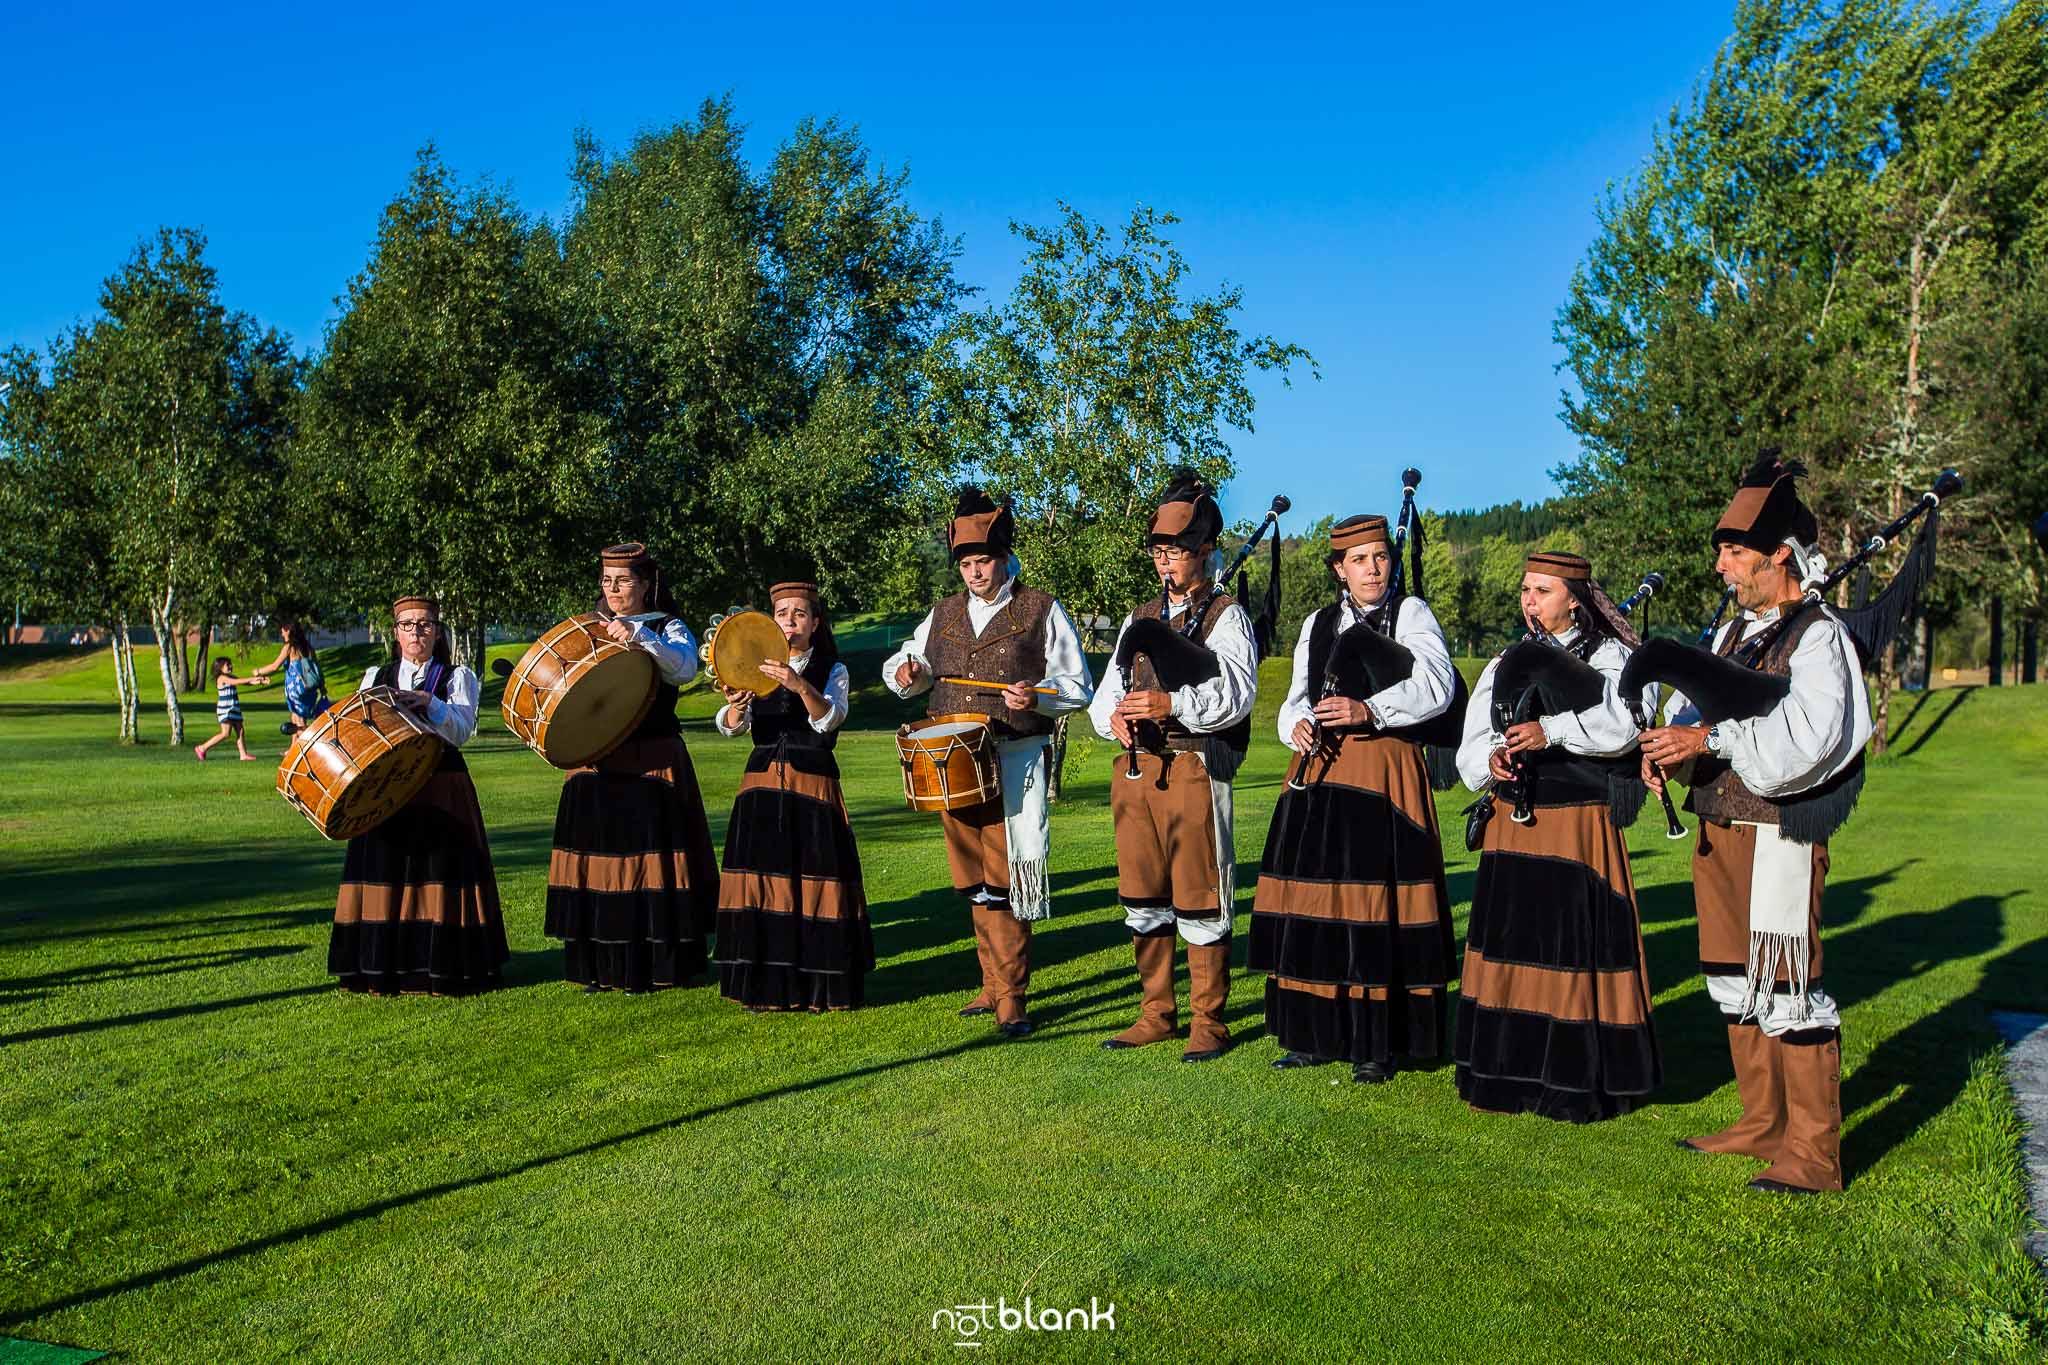 Boda en el Monasterio de Samos Lugo - Banquete Hotel Oca Aguas Santas Balneario Golf Resort - Notblank Fotógrafos De Boda Galicia